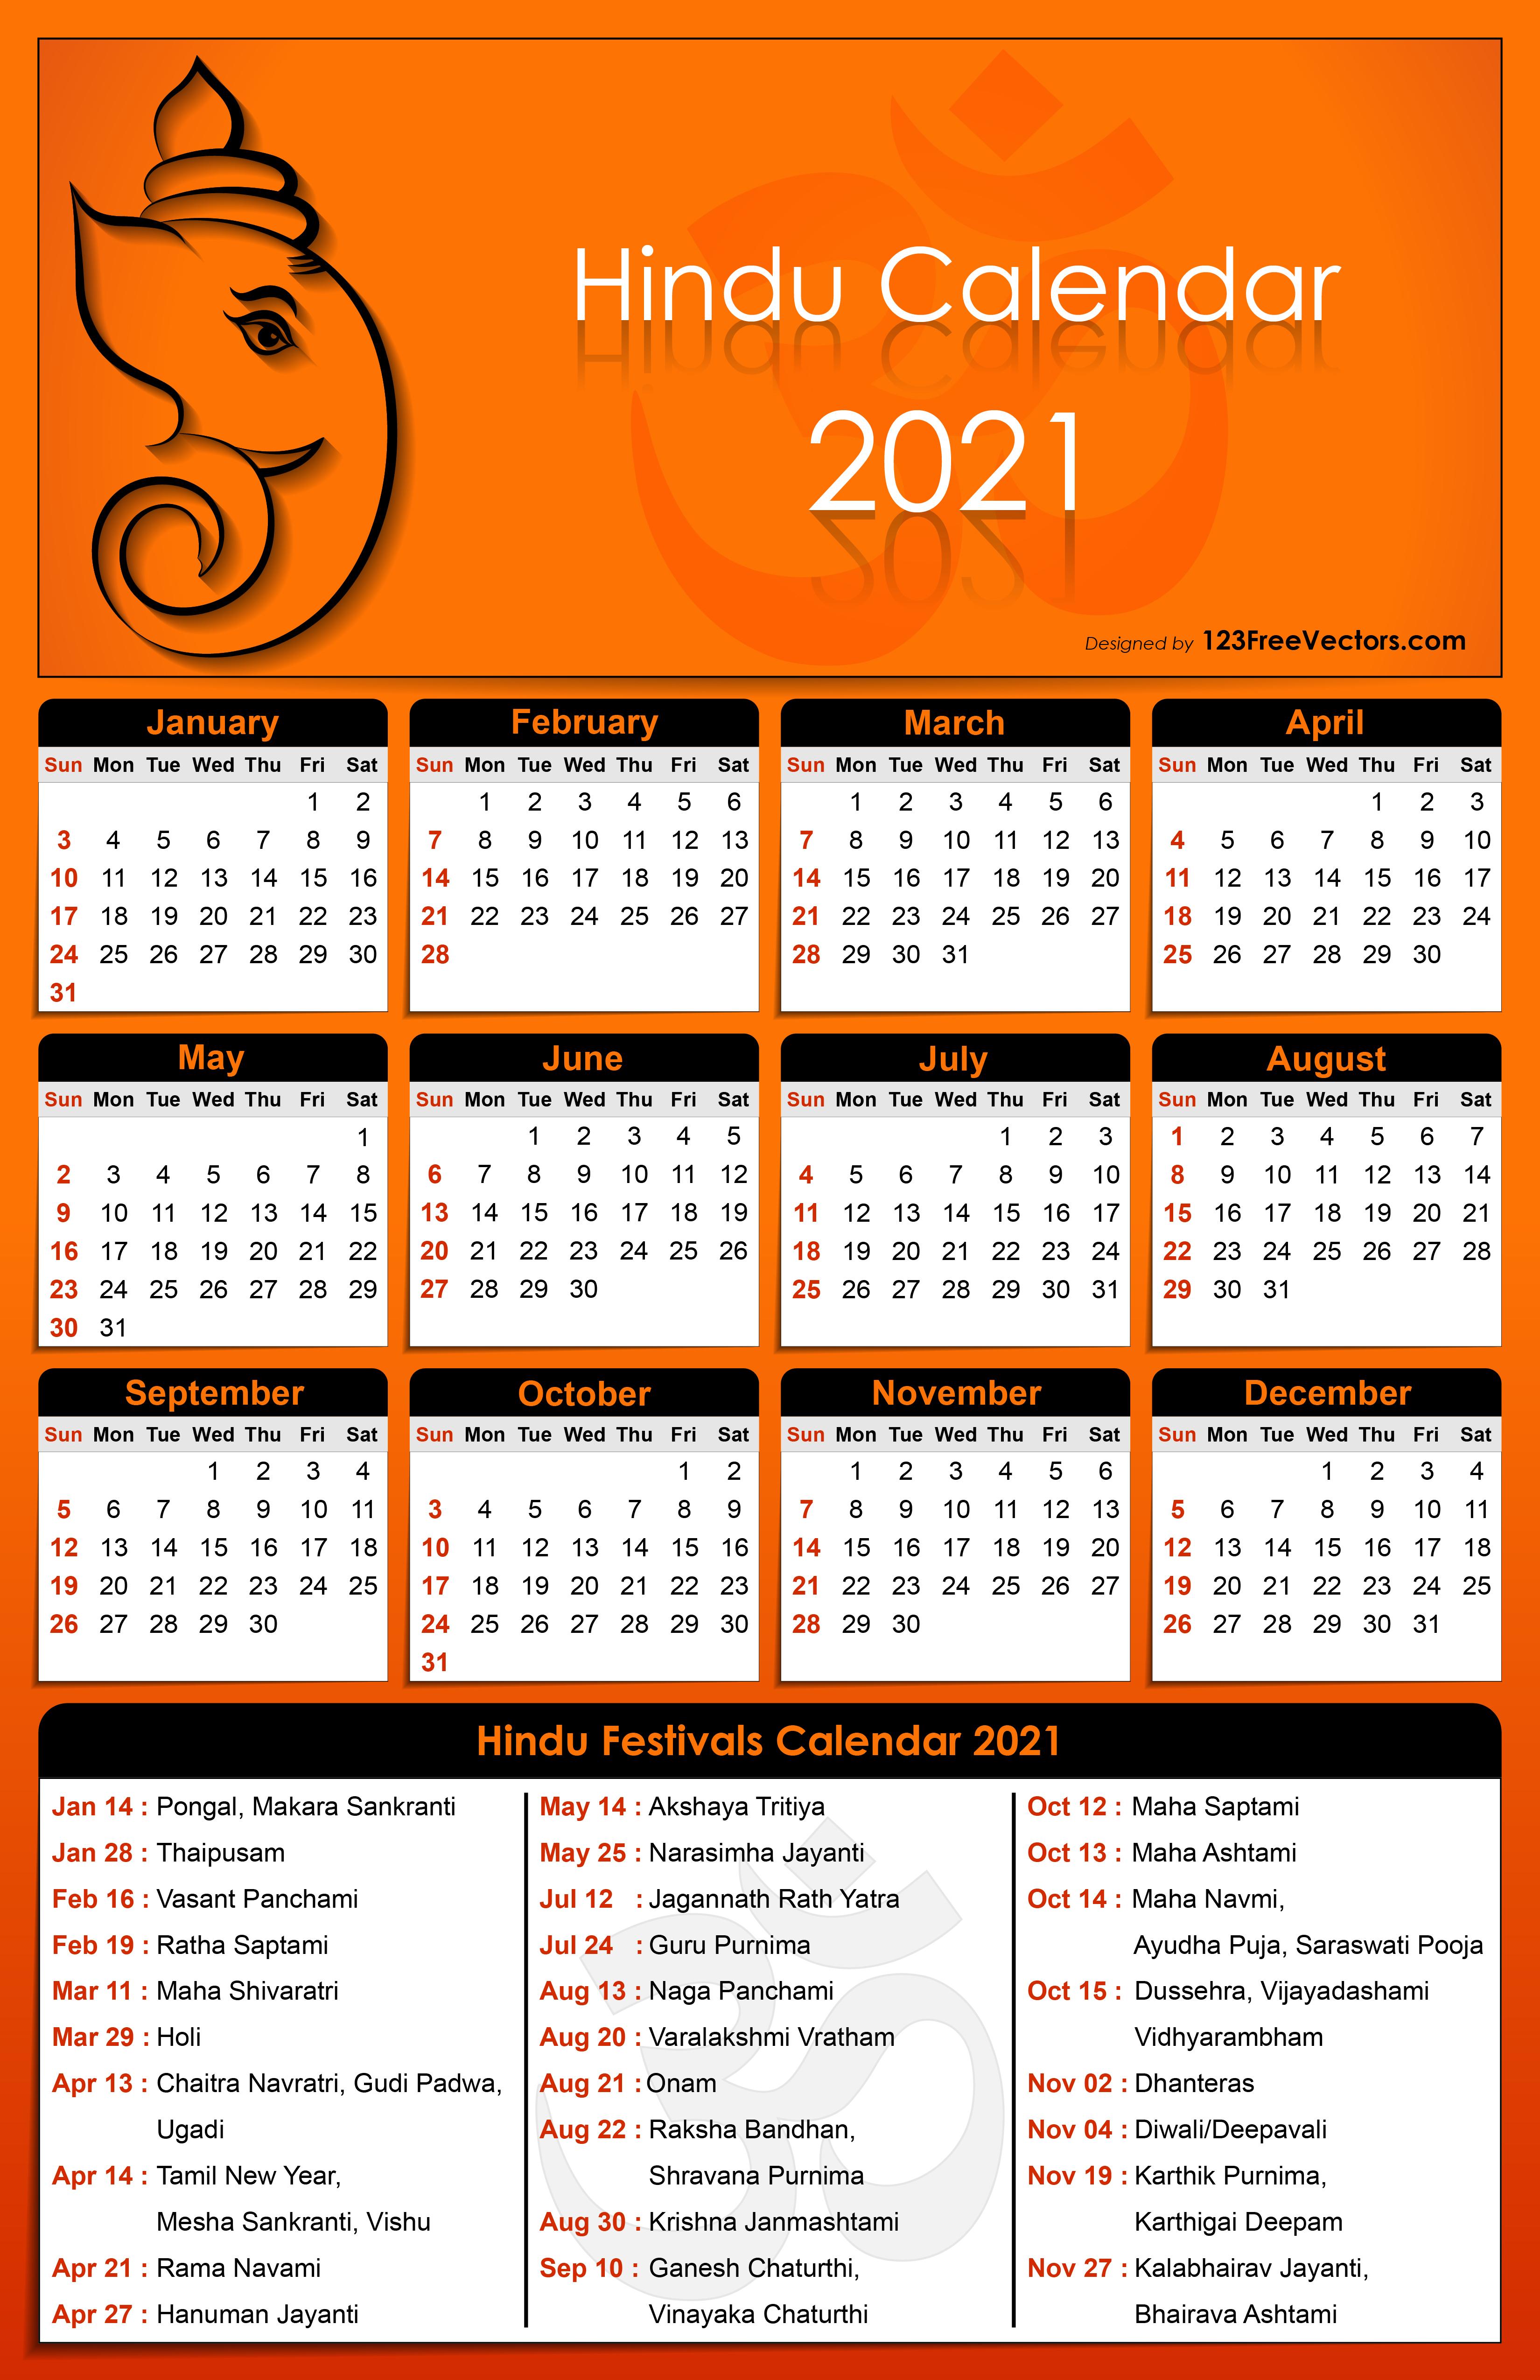 Hindu Festival Calendar 2021 Free Hindu Calendar 2021